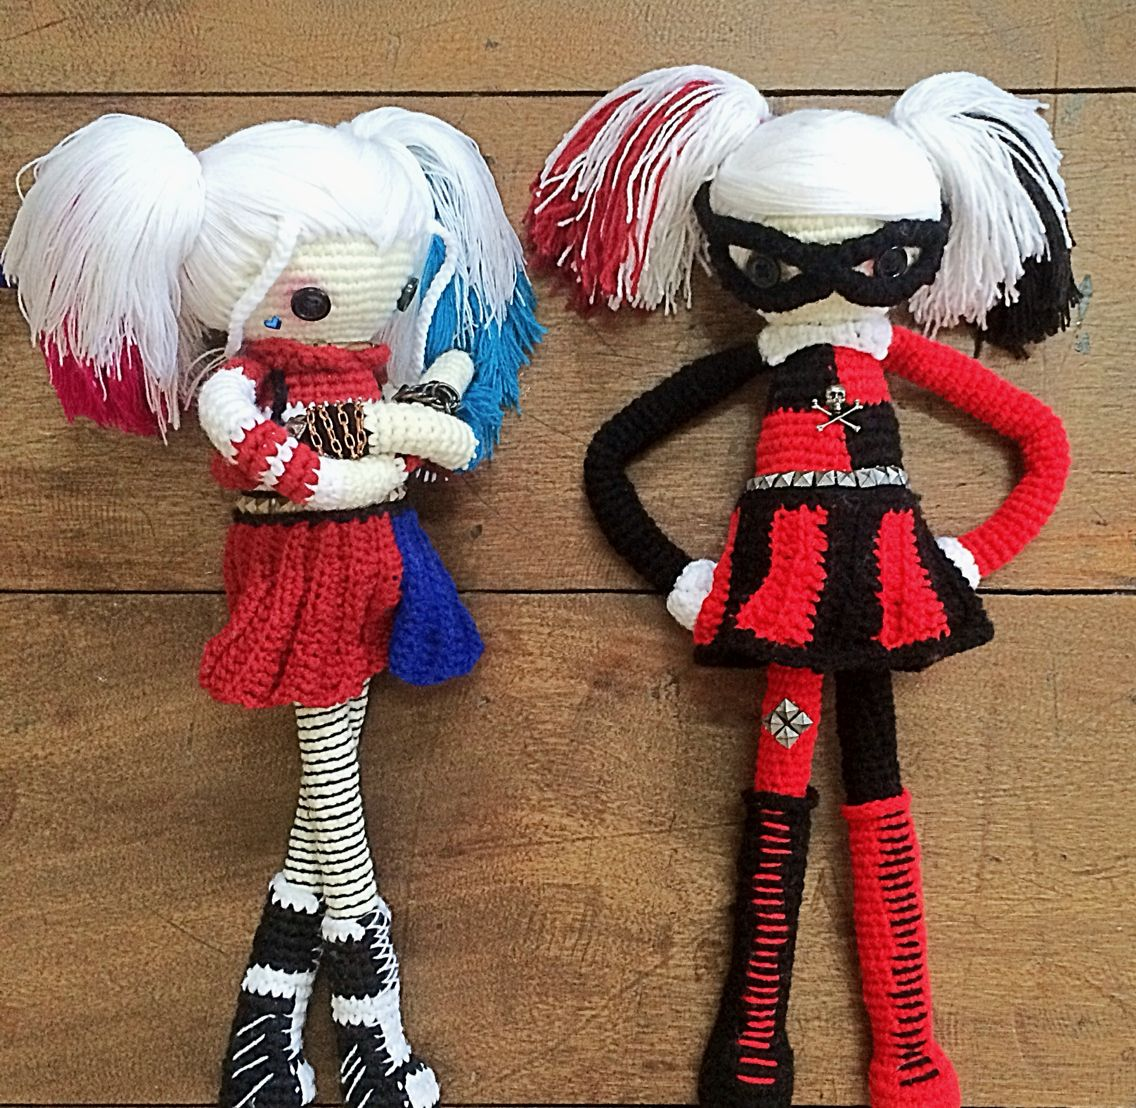 Amigurumi Harley Quinn : Harley Quinn and Harley Quinn crocheted art dolls based on ...